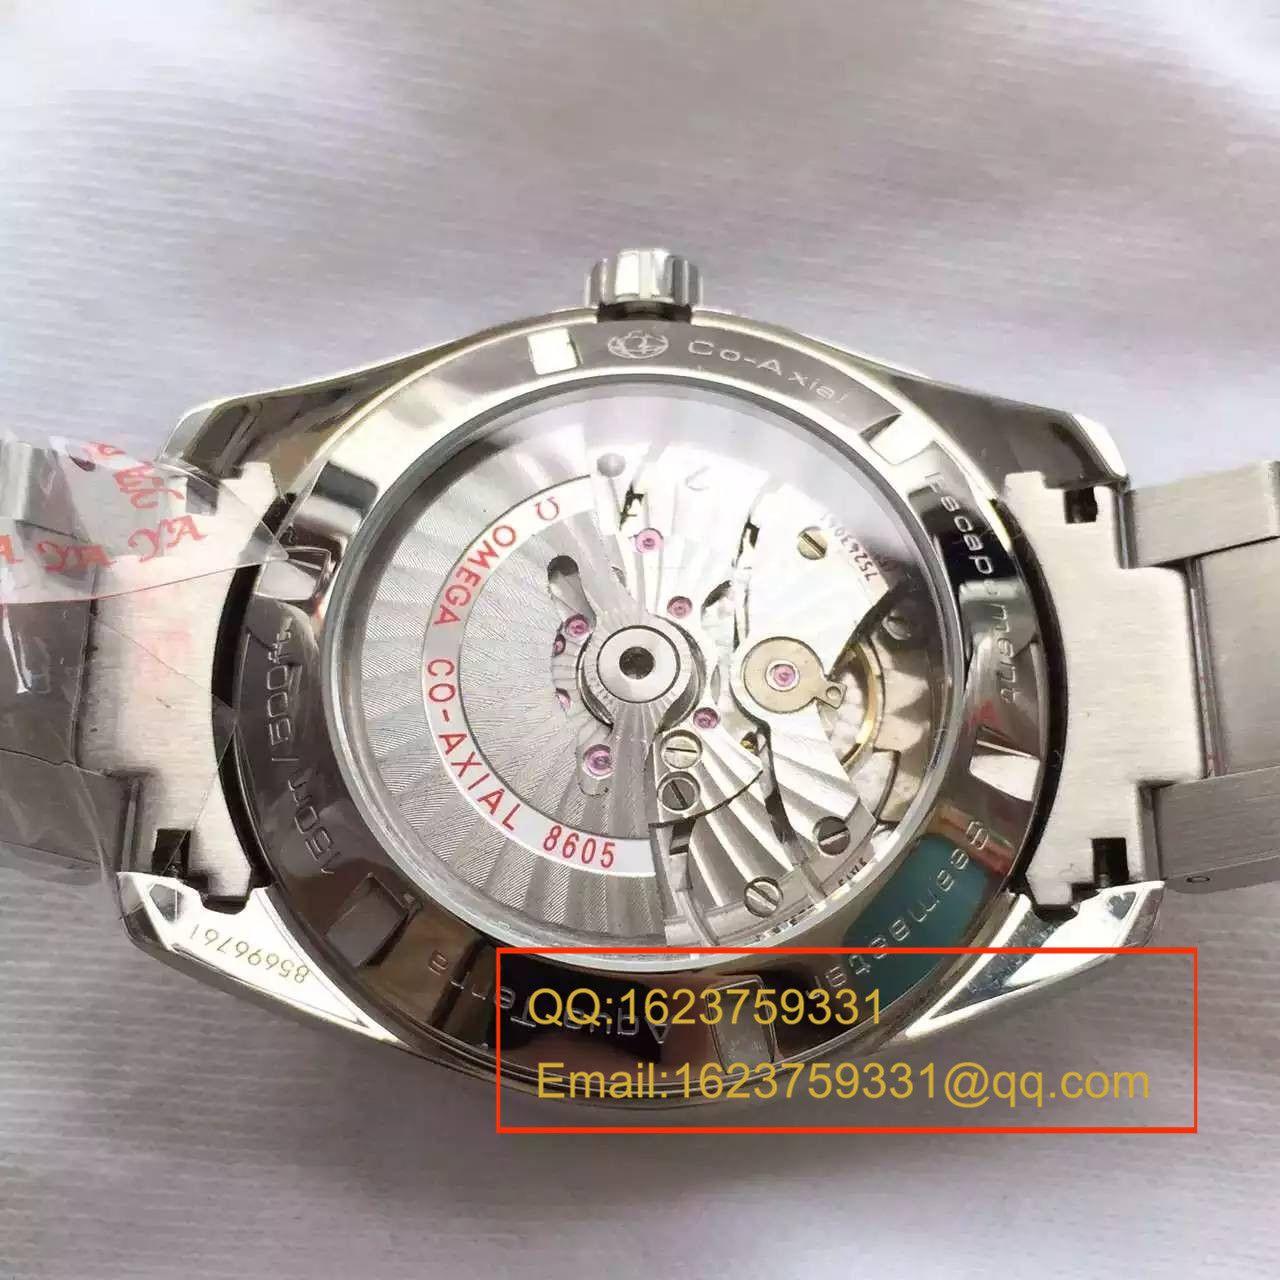 【KW厂一比一精仿手表】欧米茄海马系列231.10.43.22.01.001机械手表 / M133